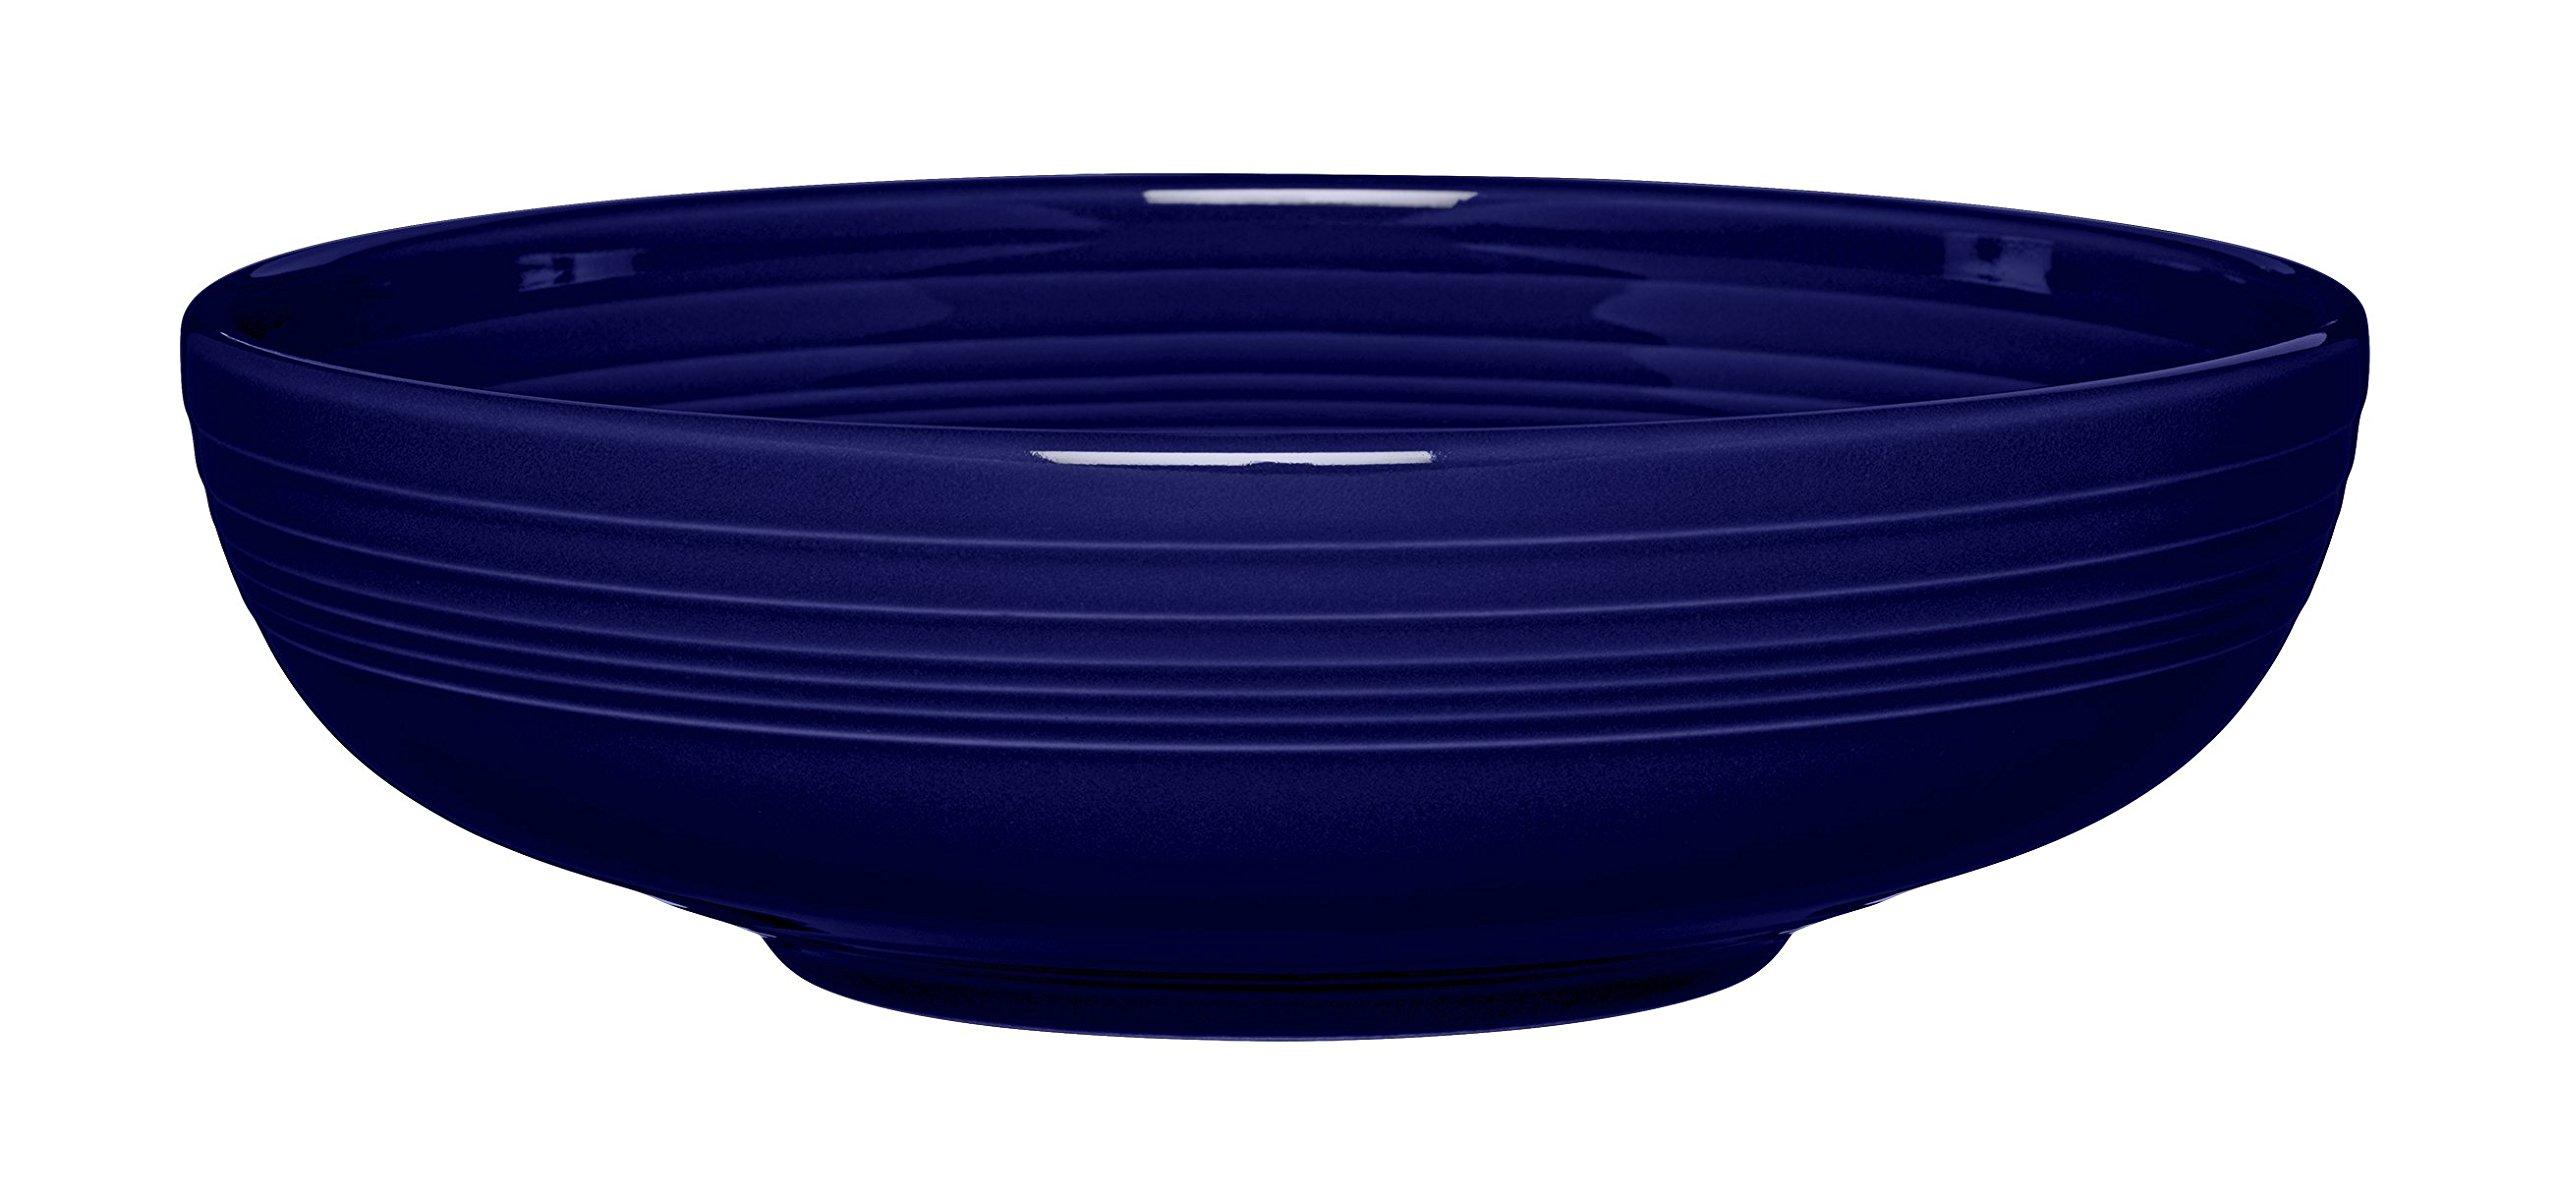 Fiesta Bistro Serving Bowl, 96 oz, Cobalt